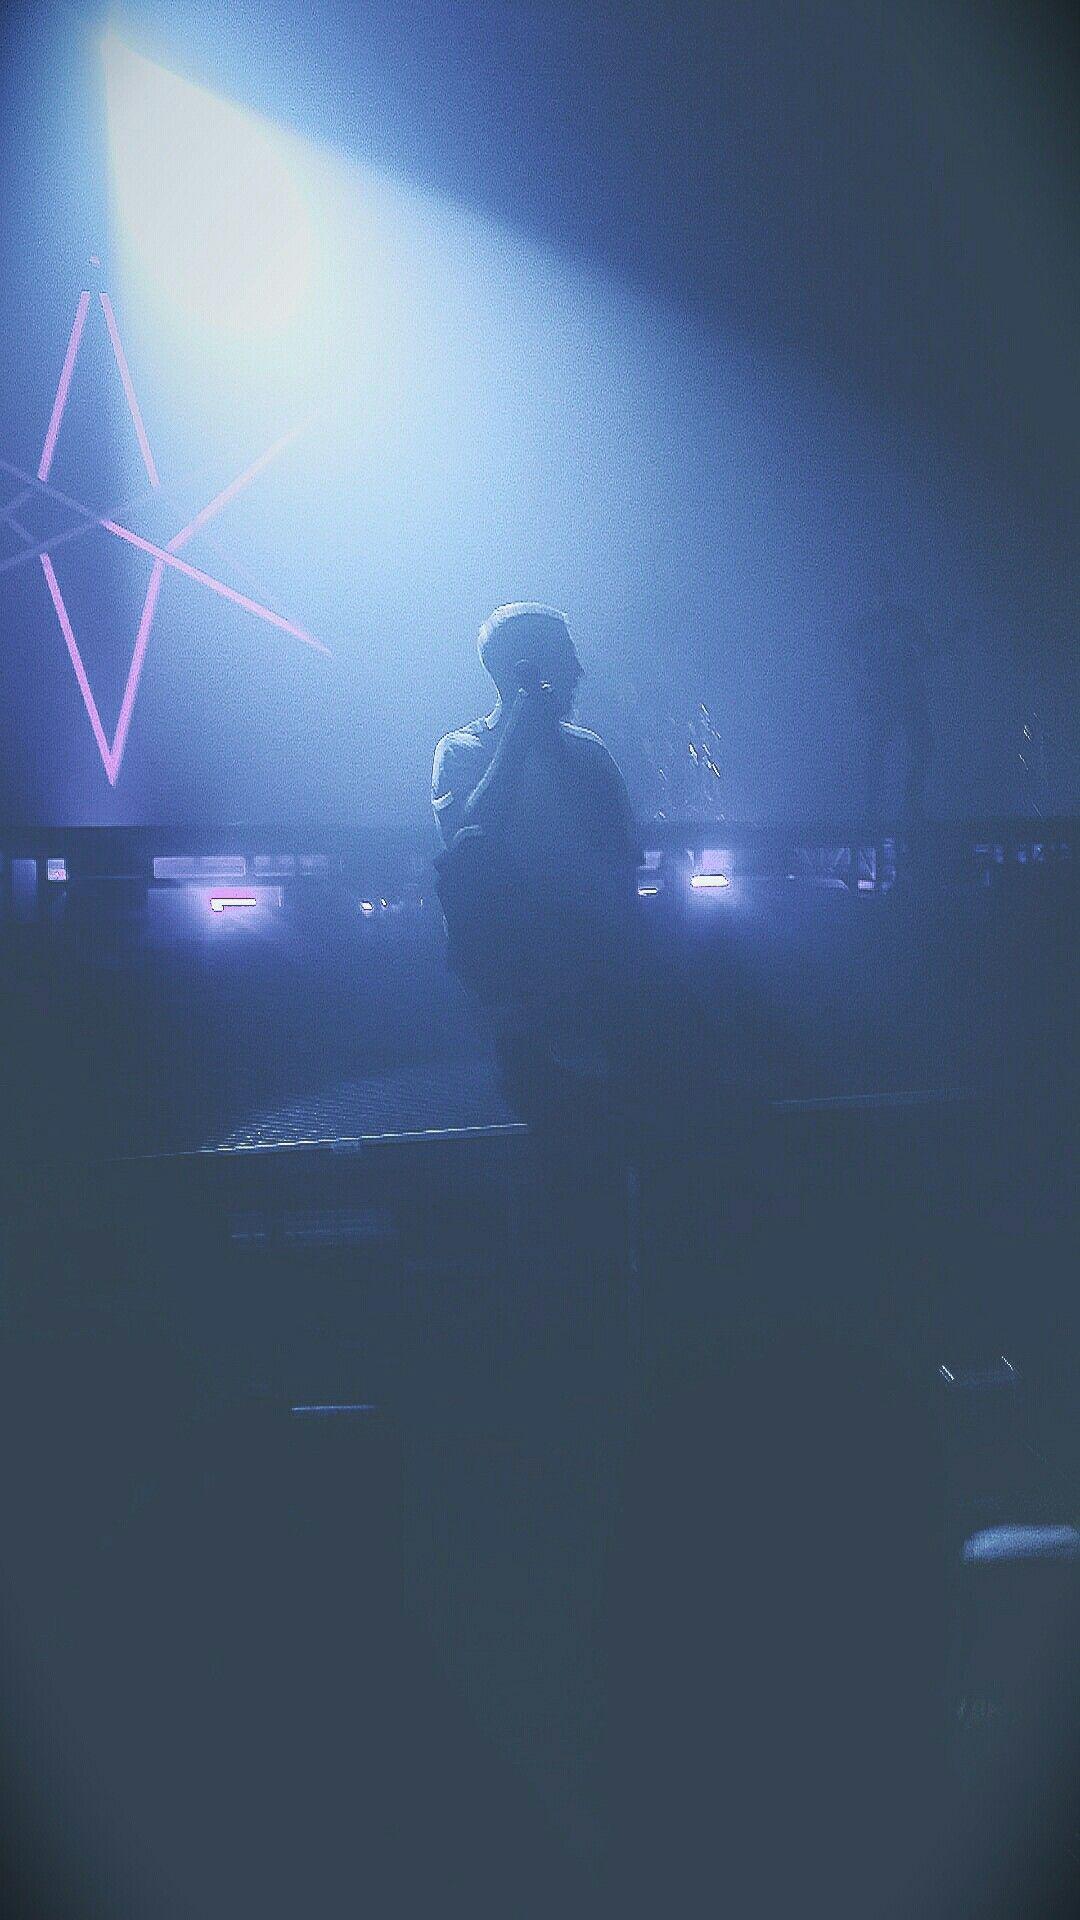 BMTH / Oliver Sykes amo 2018 Düsseldorf / Germany bmth